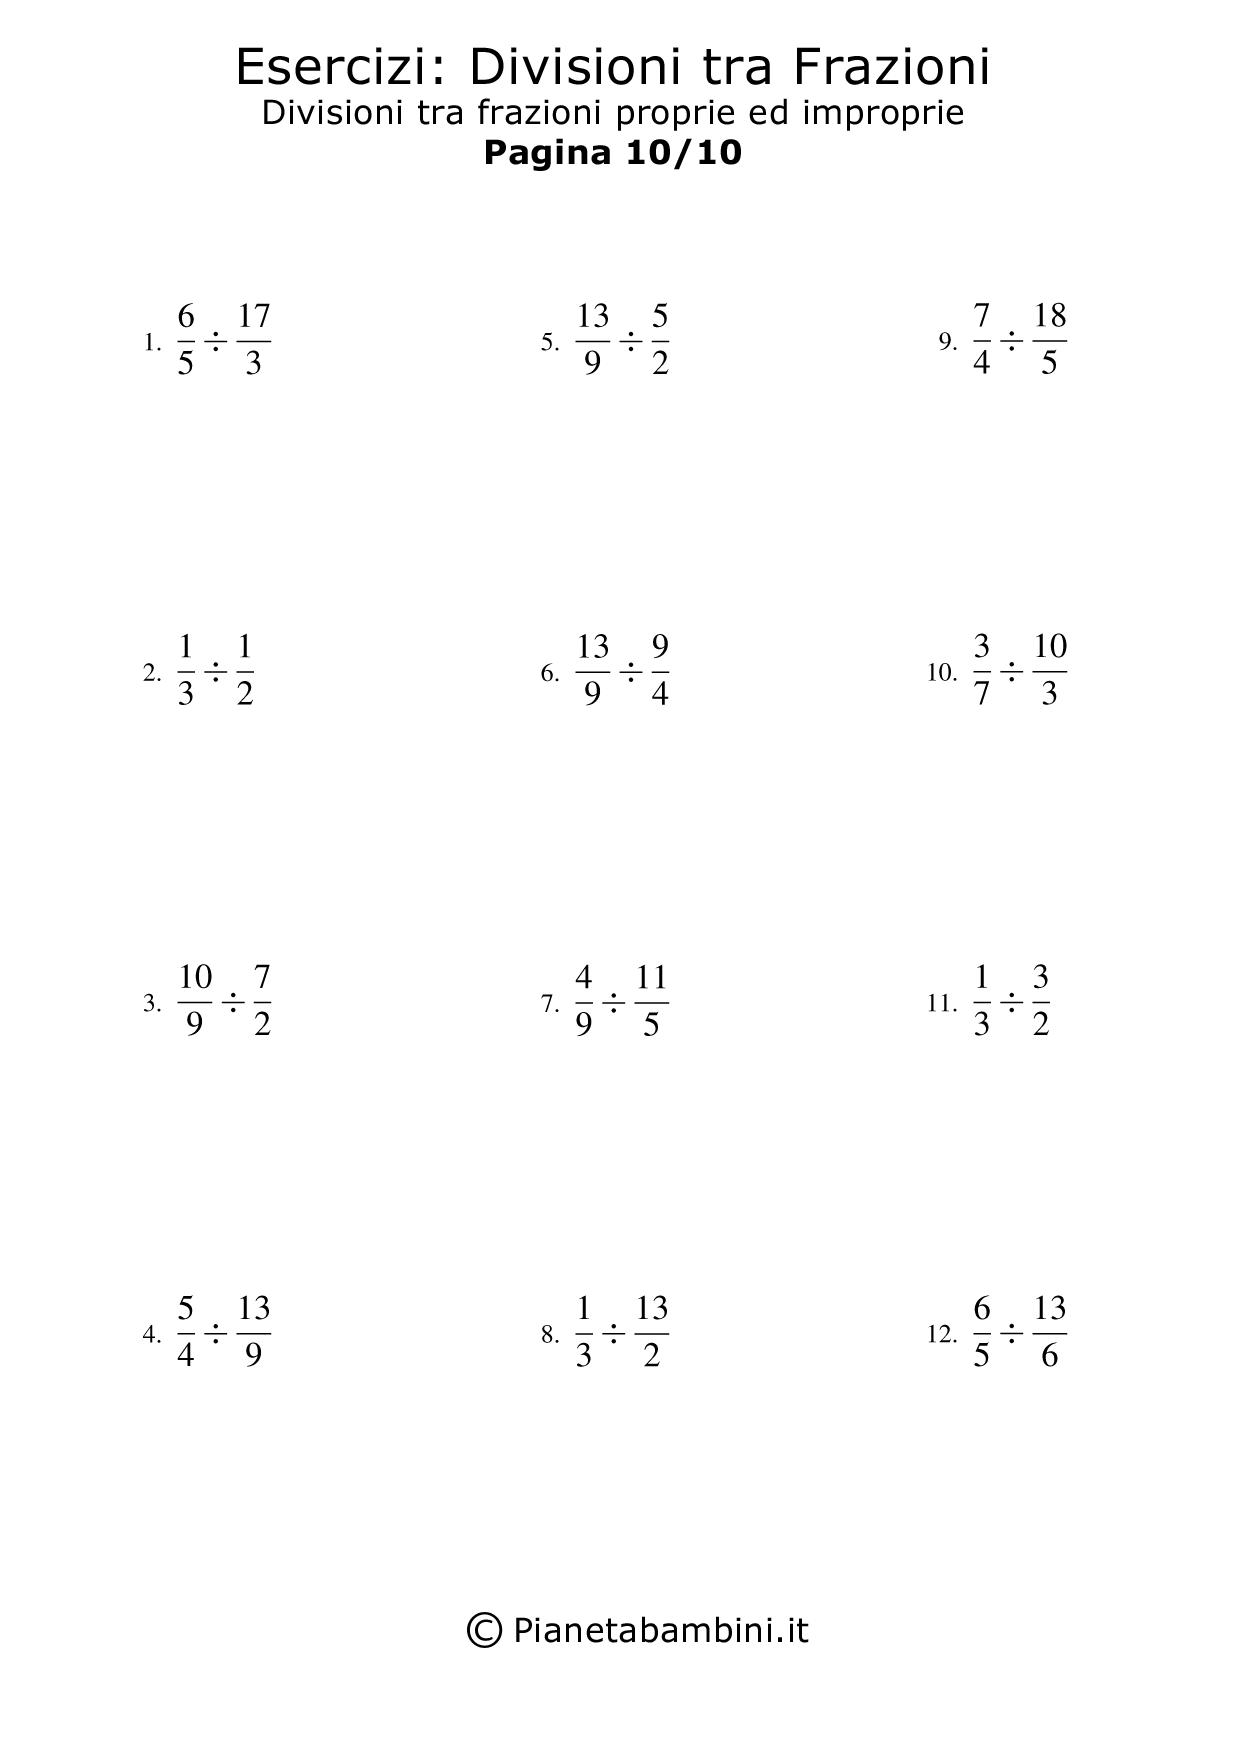 Esercizi-Divisioni-Frazioni-Proprie-Improprie_10